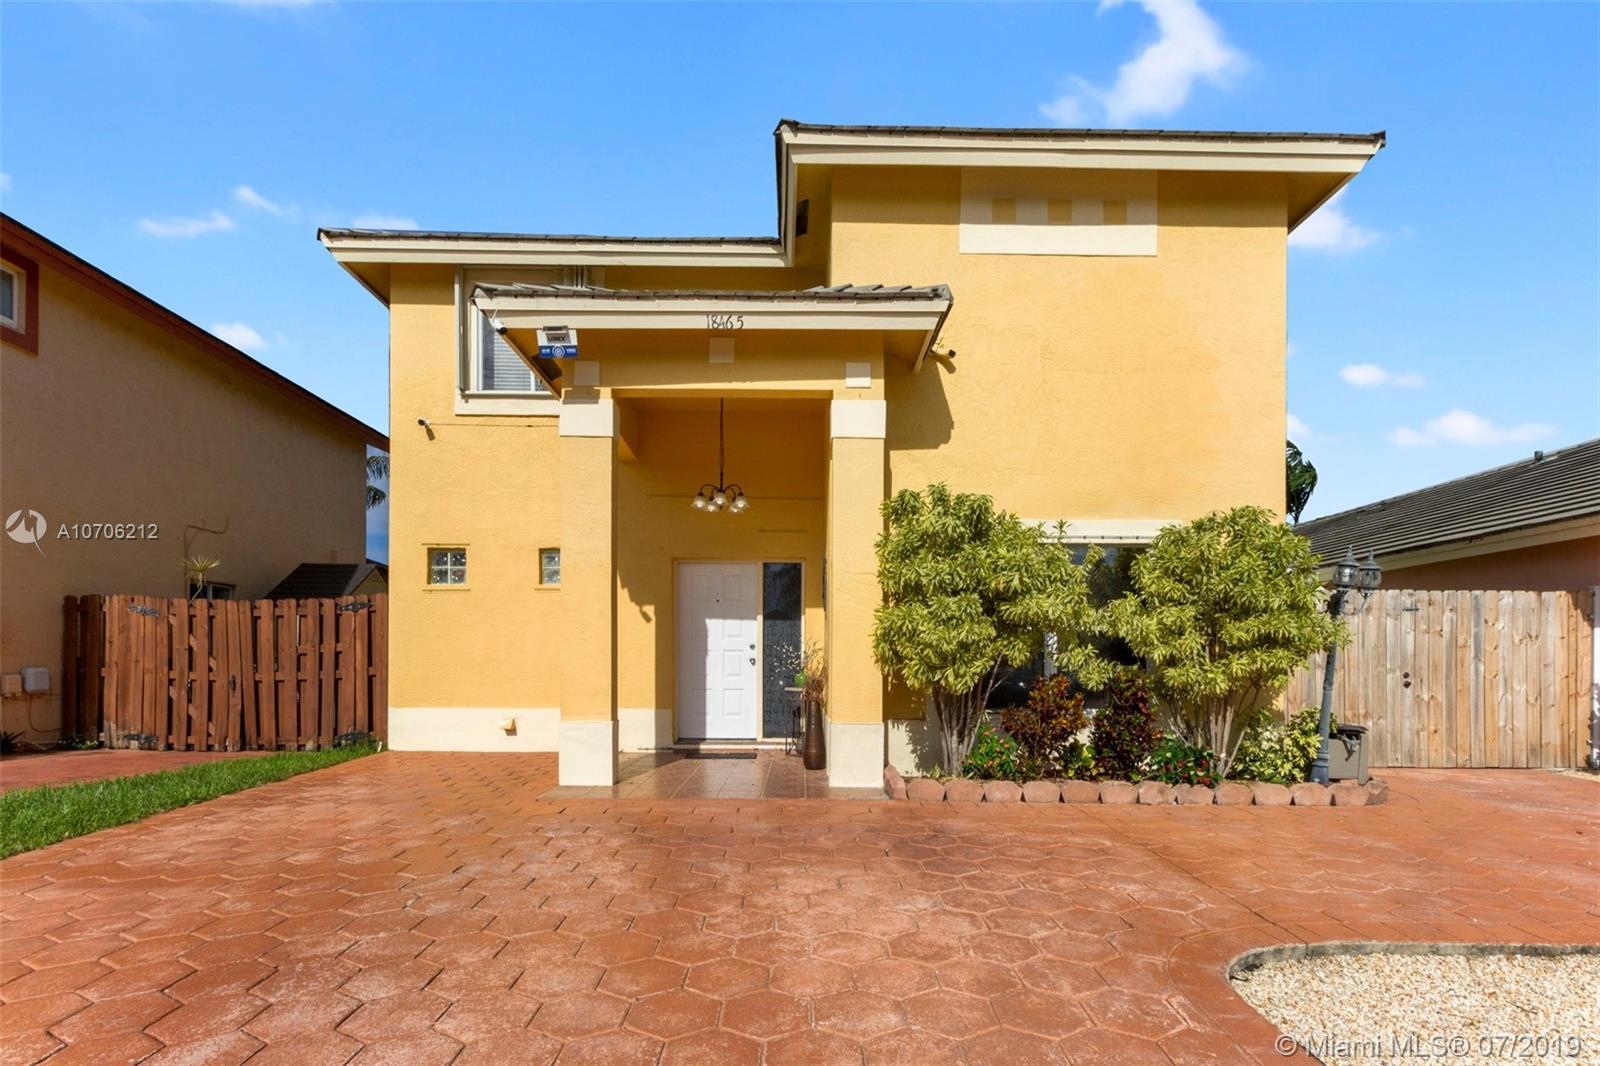 18465 Nw 56 Ave Miami Gardens, FL 33055